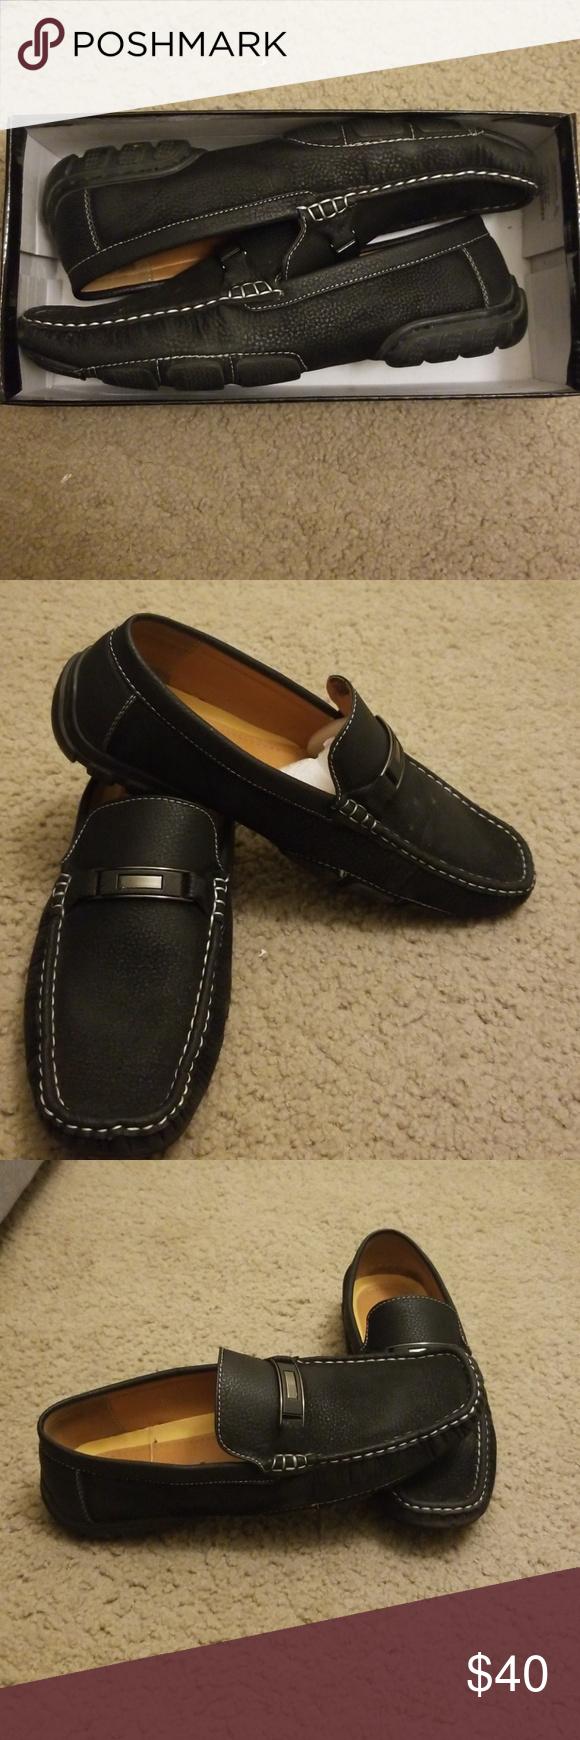 Starsax Casual Dress Loafer Dress Loafers Loafers Dress Shoes Men [ 1740 x 580 Pixel ]